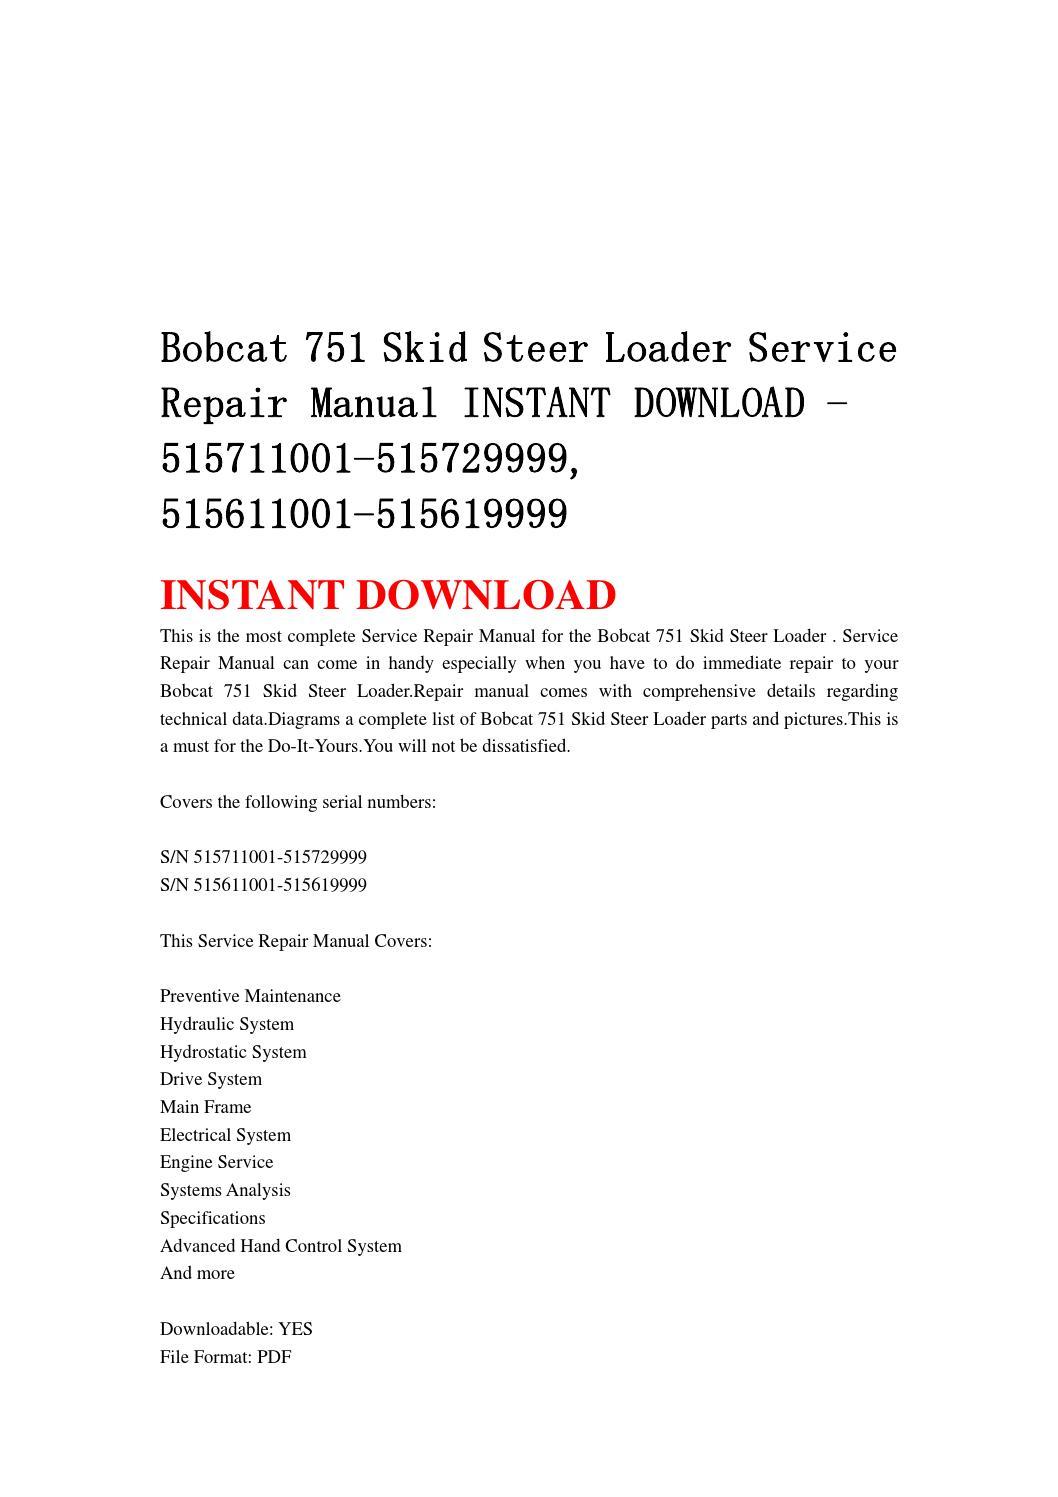 hight resolution of bobcat 751 skid steer loader service repair manual instant download 515711001 515729999 515611001 5